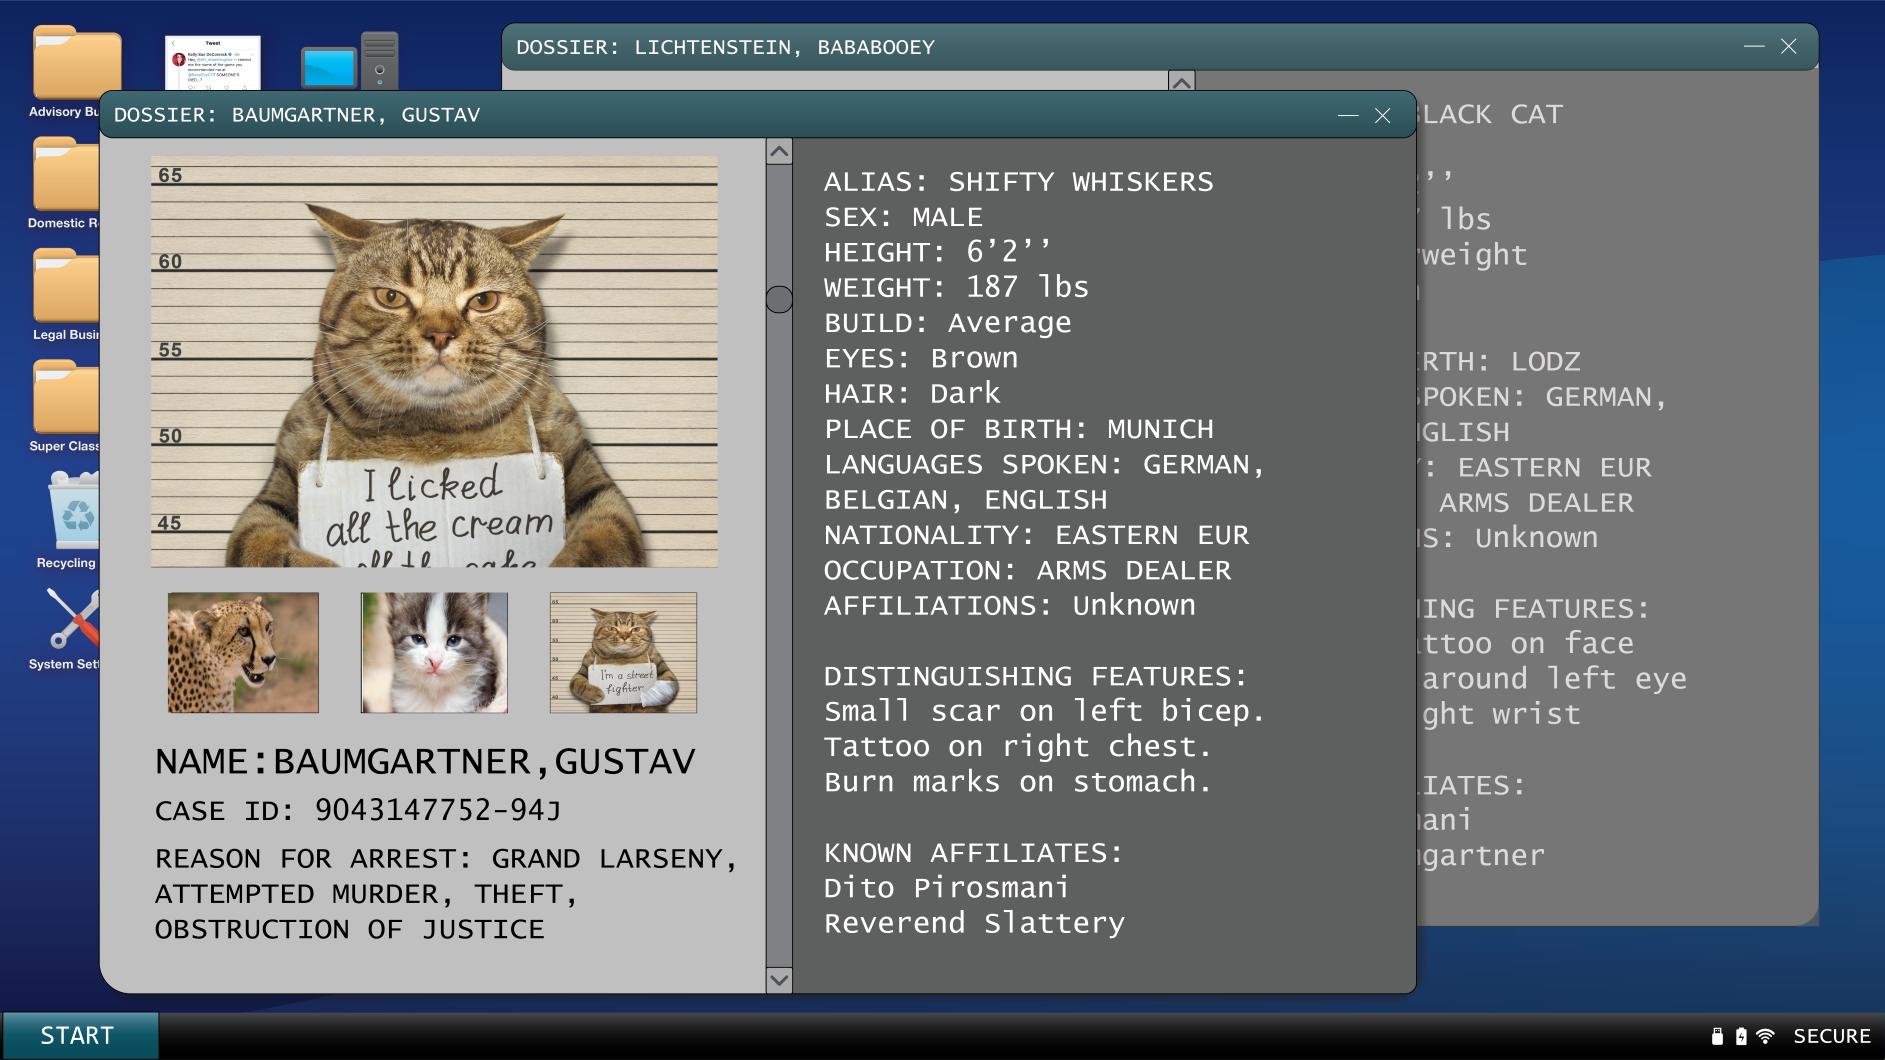 nsa monitors v2_Dossiers 4web.png